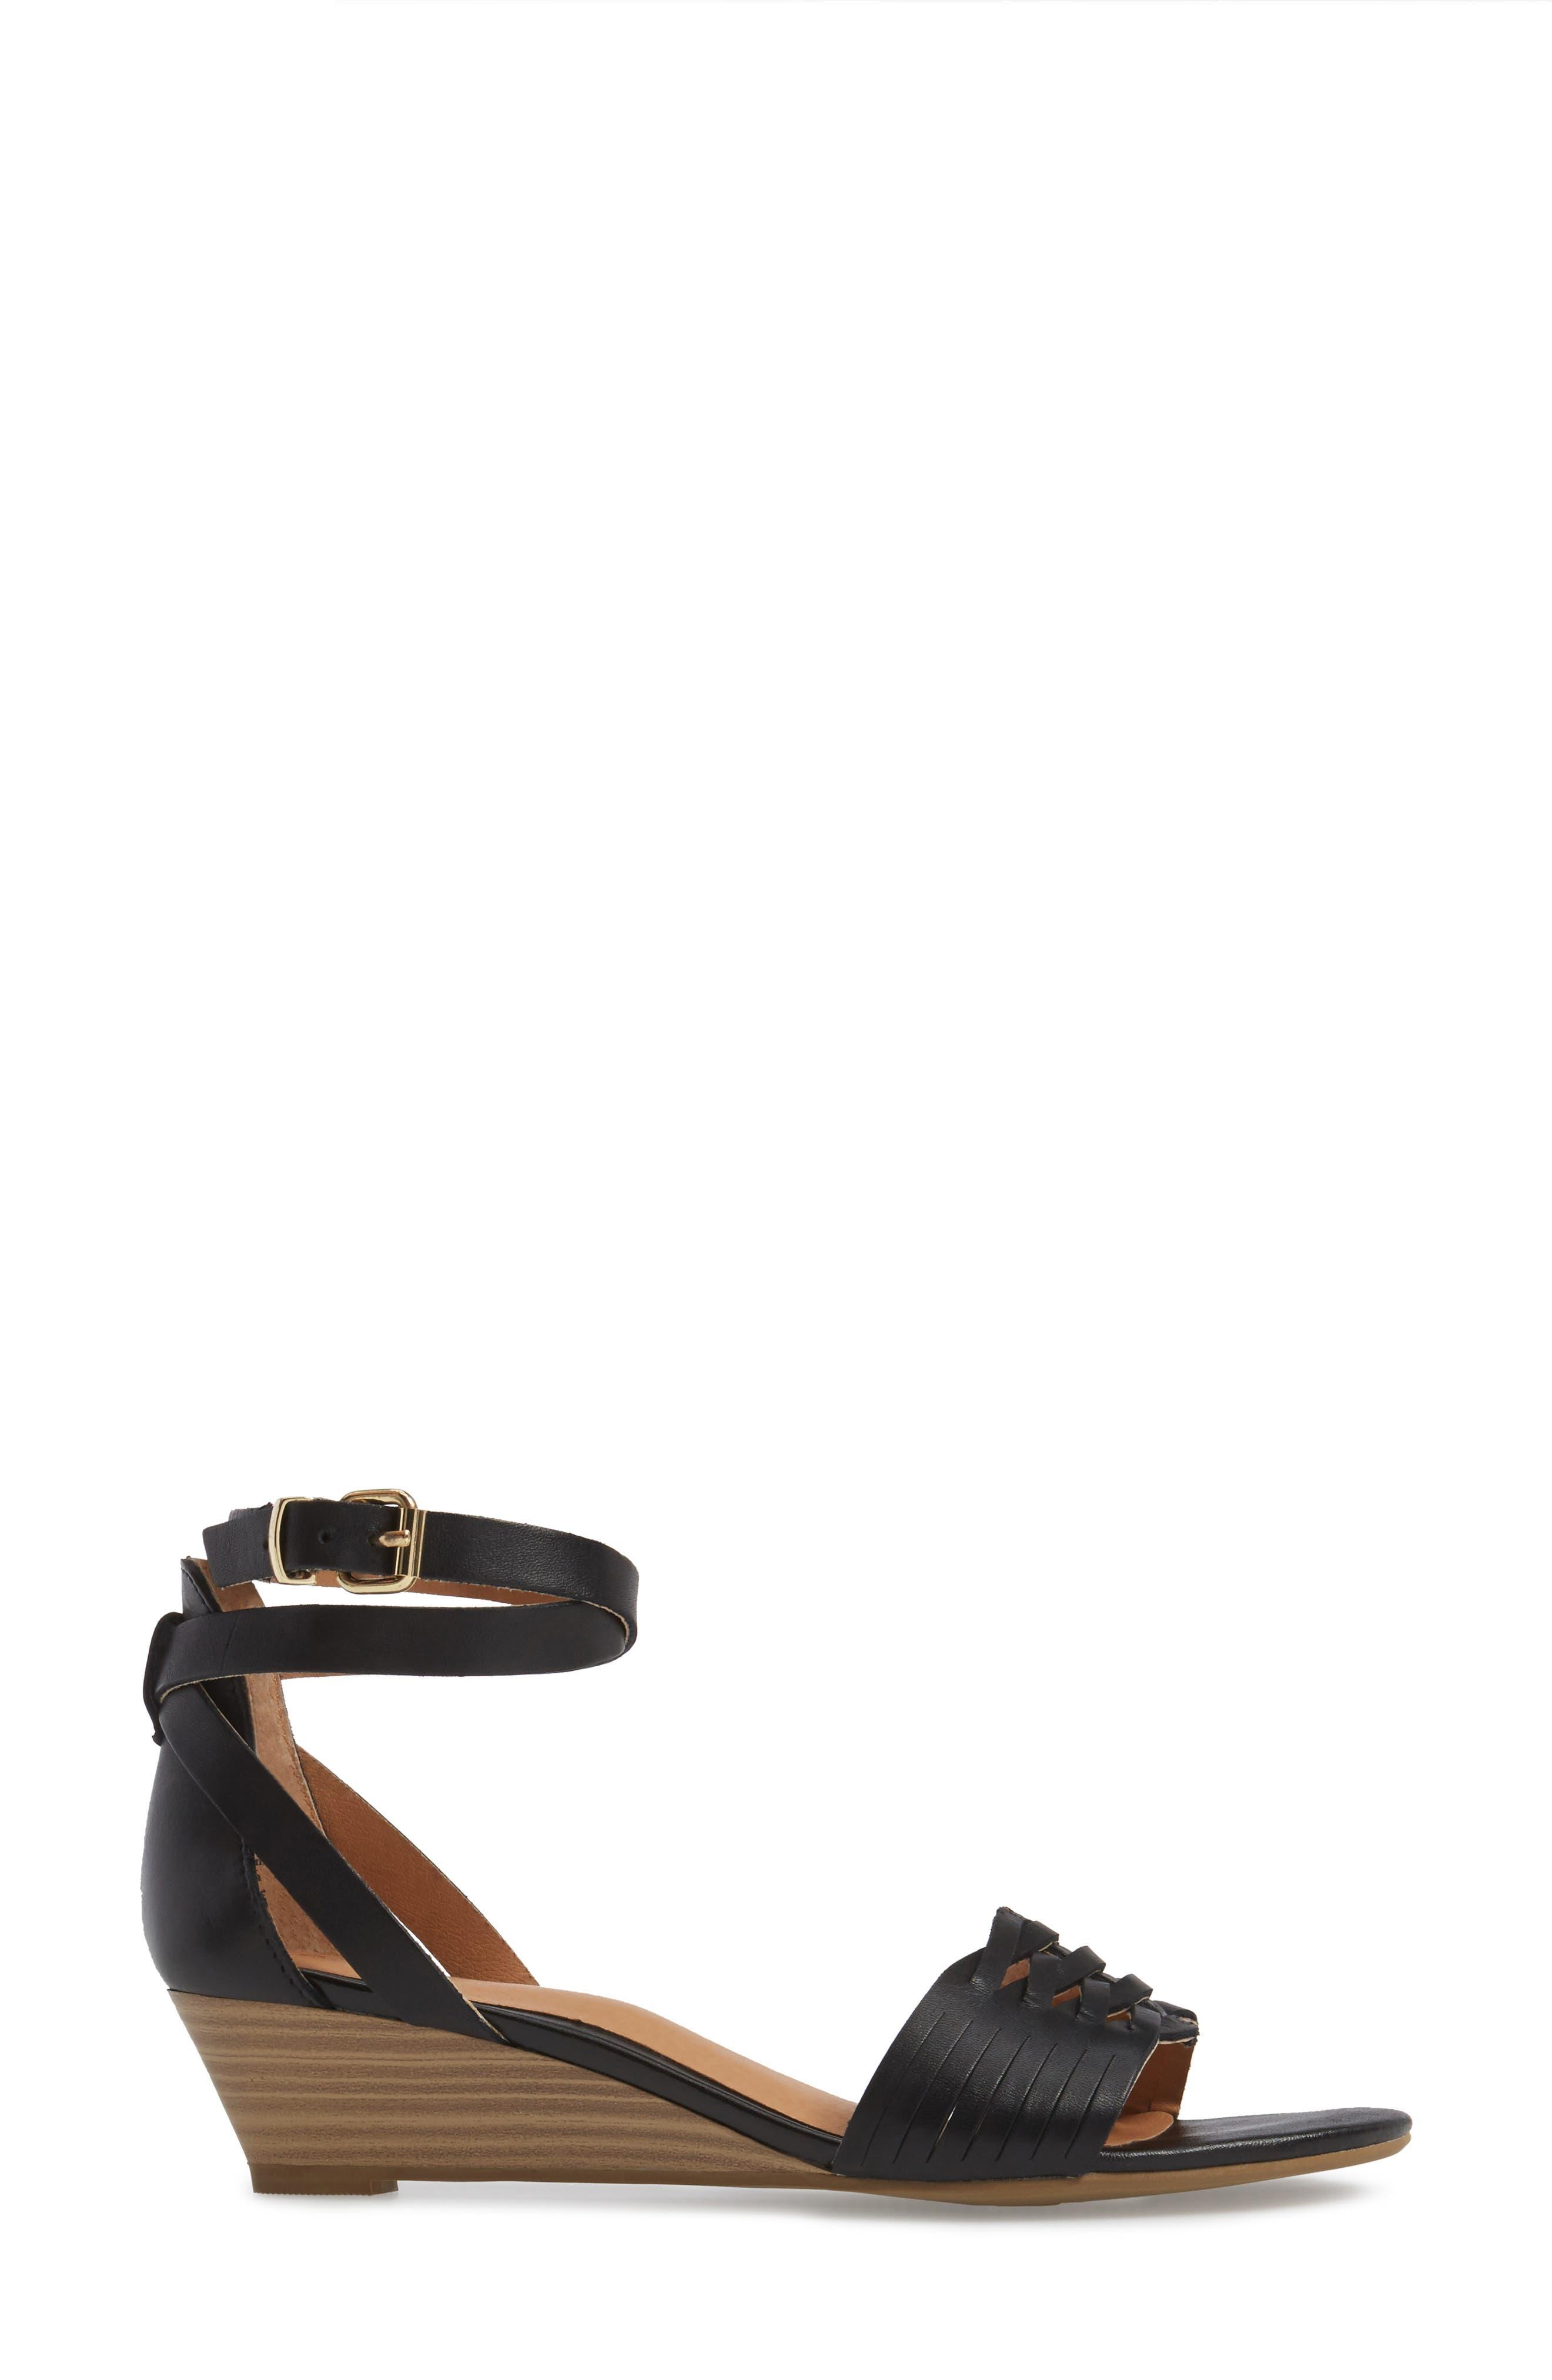 Sincere Wraparound Wedge Sandal,                             Alternate thumbnail 3, color,                             001